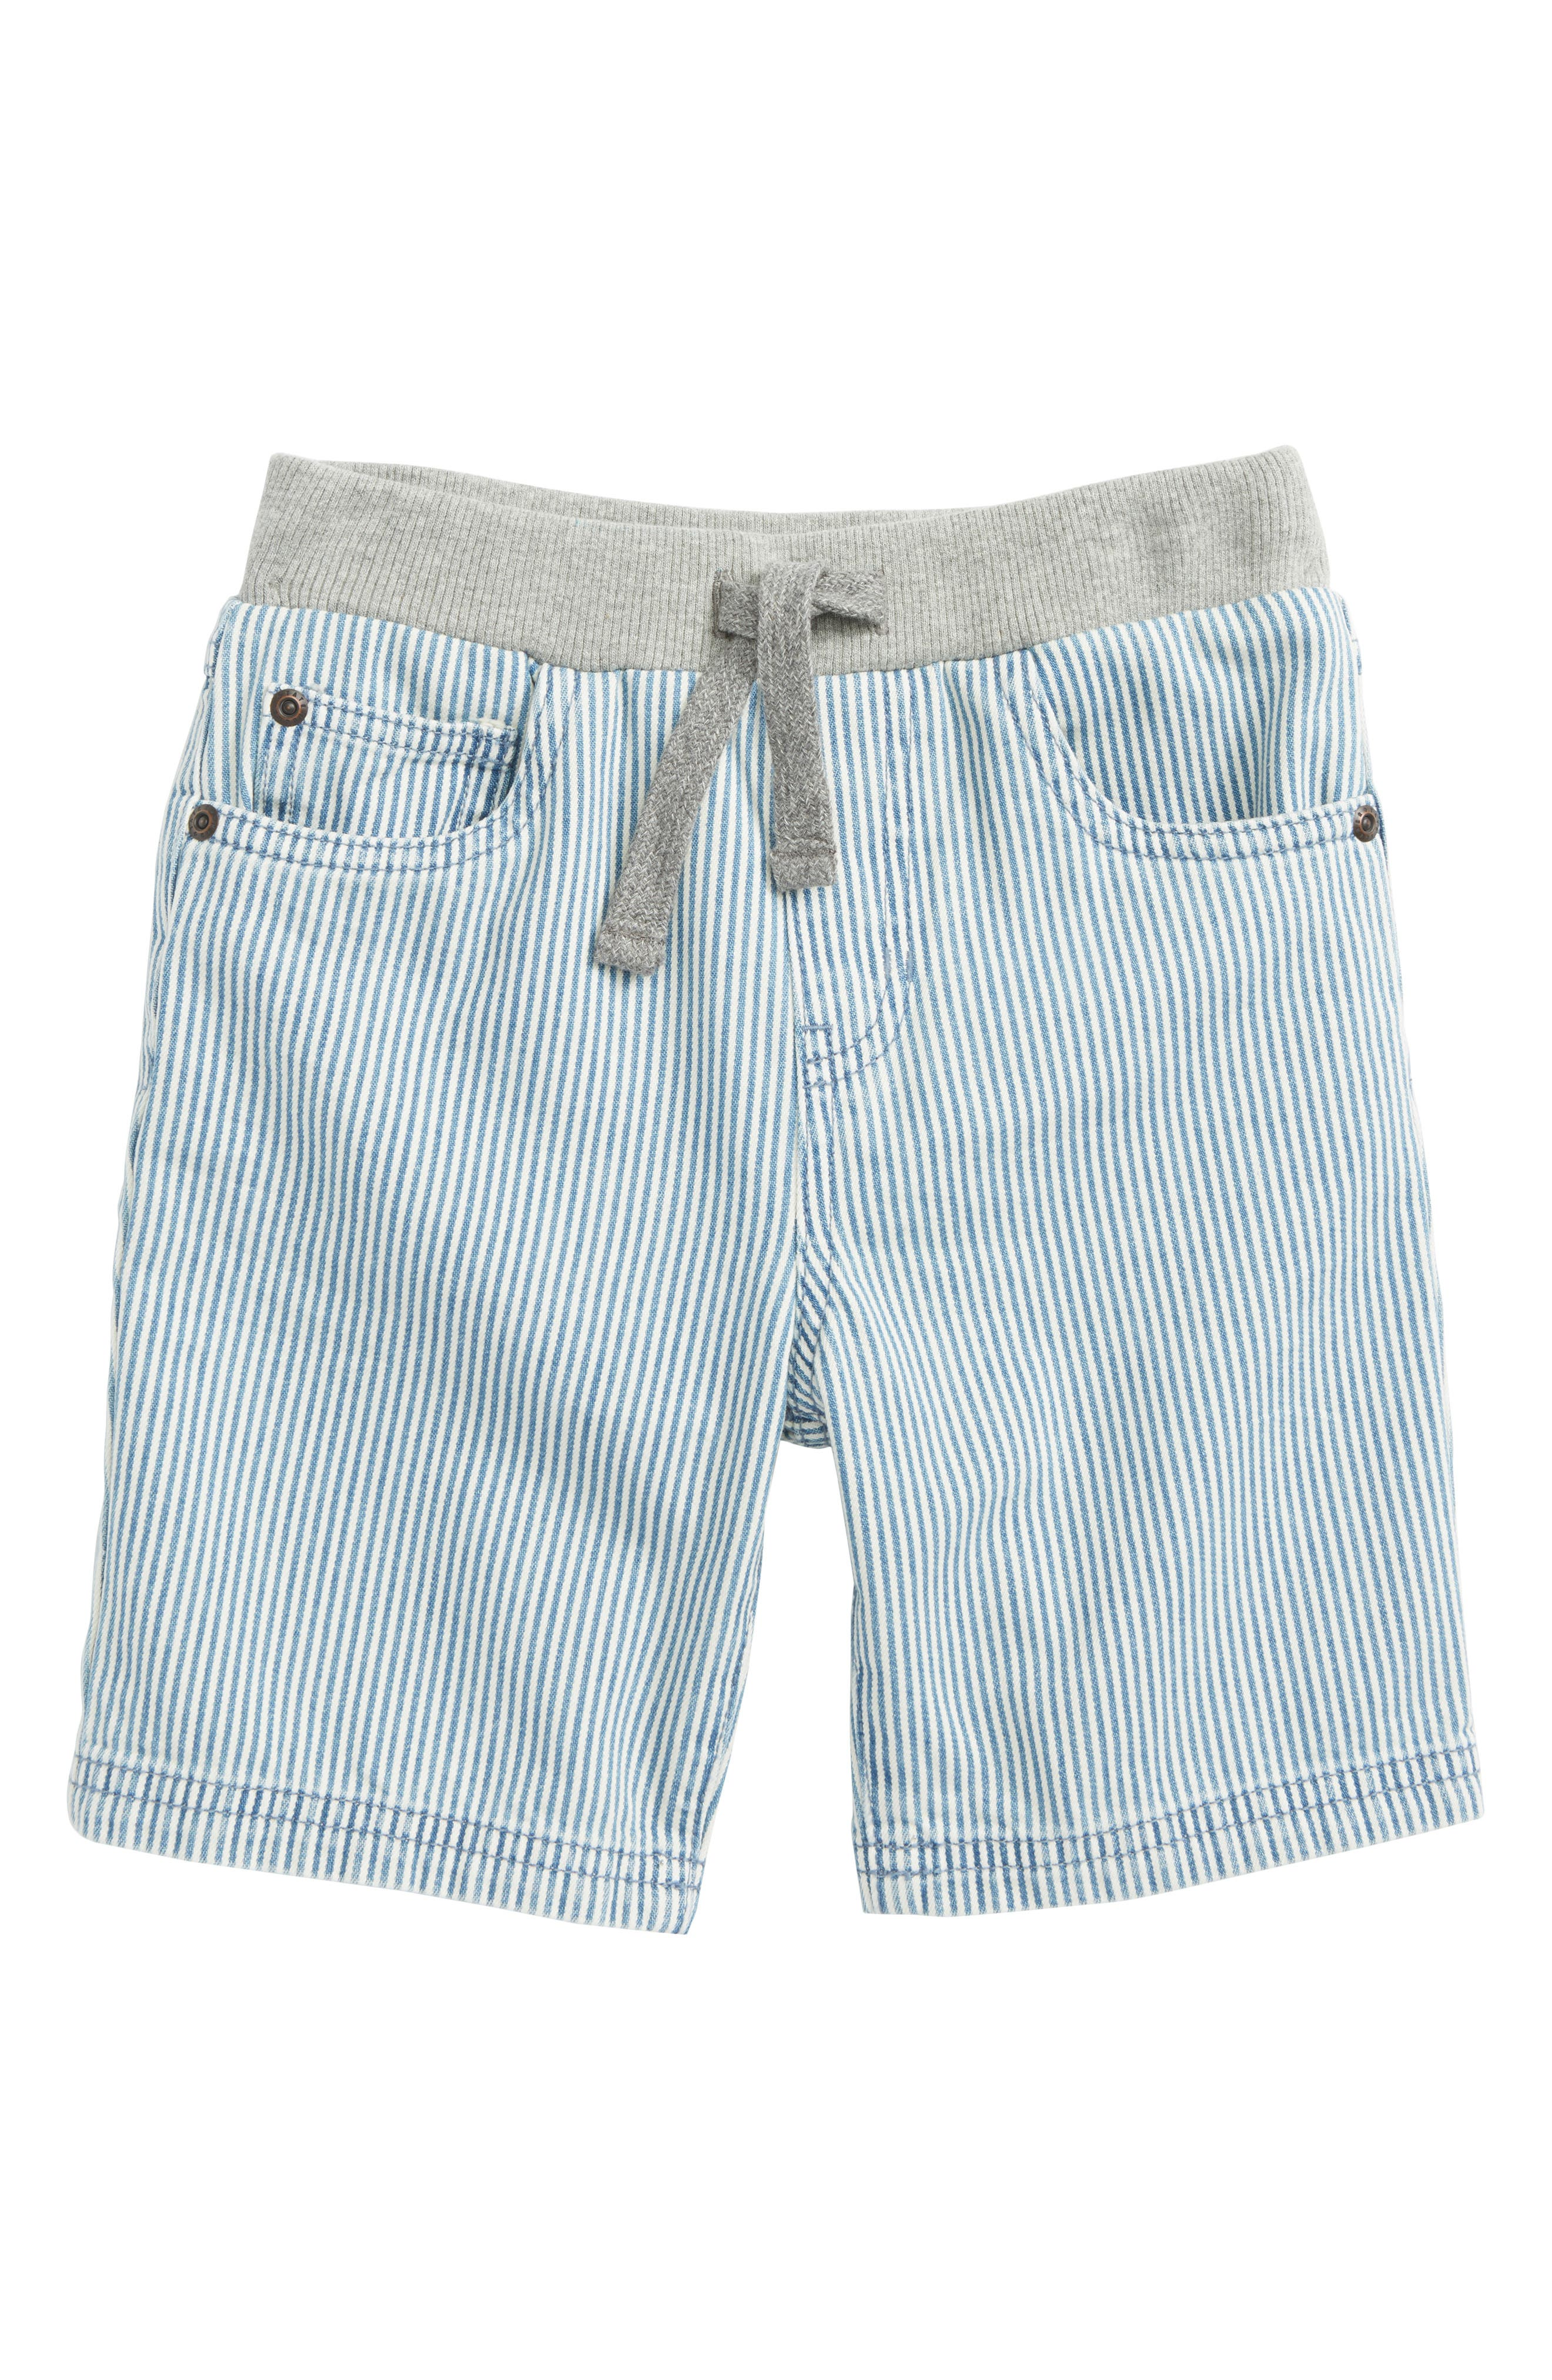 Stripe Shorts,                         Main,                         color, 450